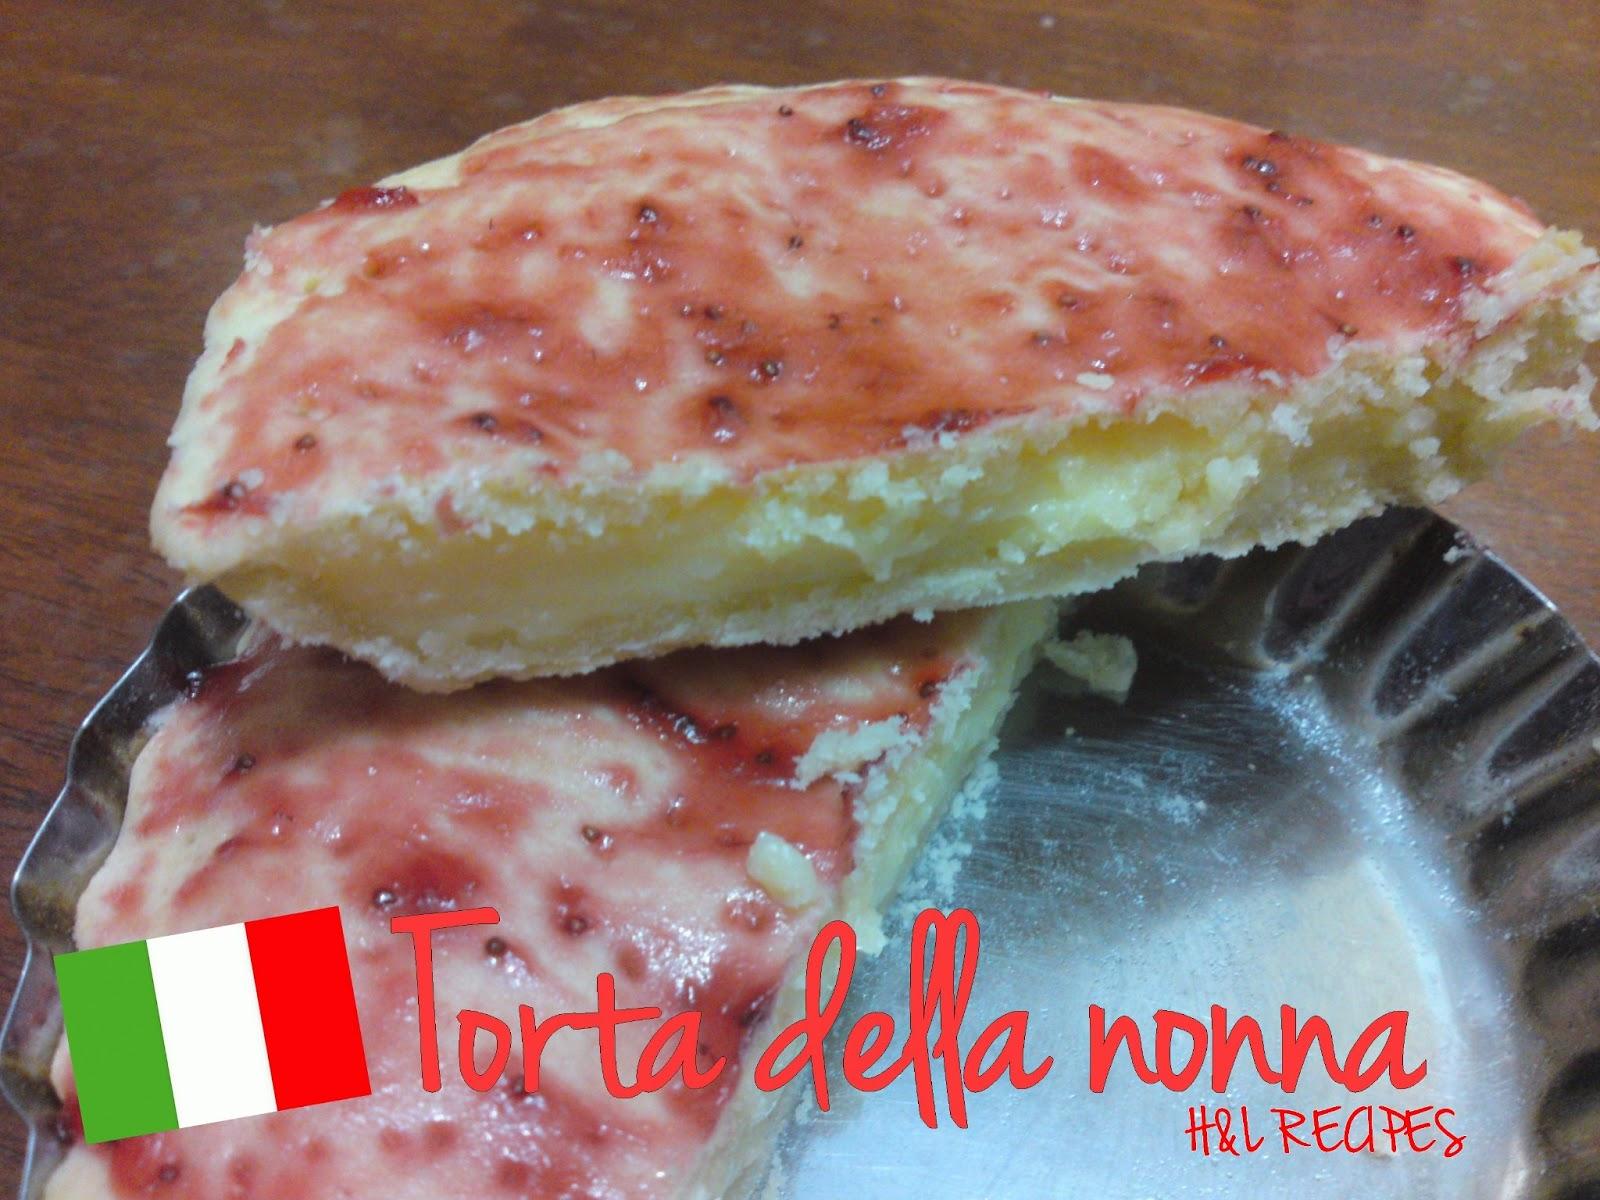 Recette italienne torta della nonna blogs de cuisine - Cuisine italienne blog ...